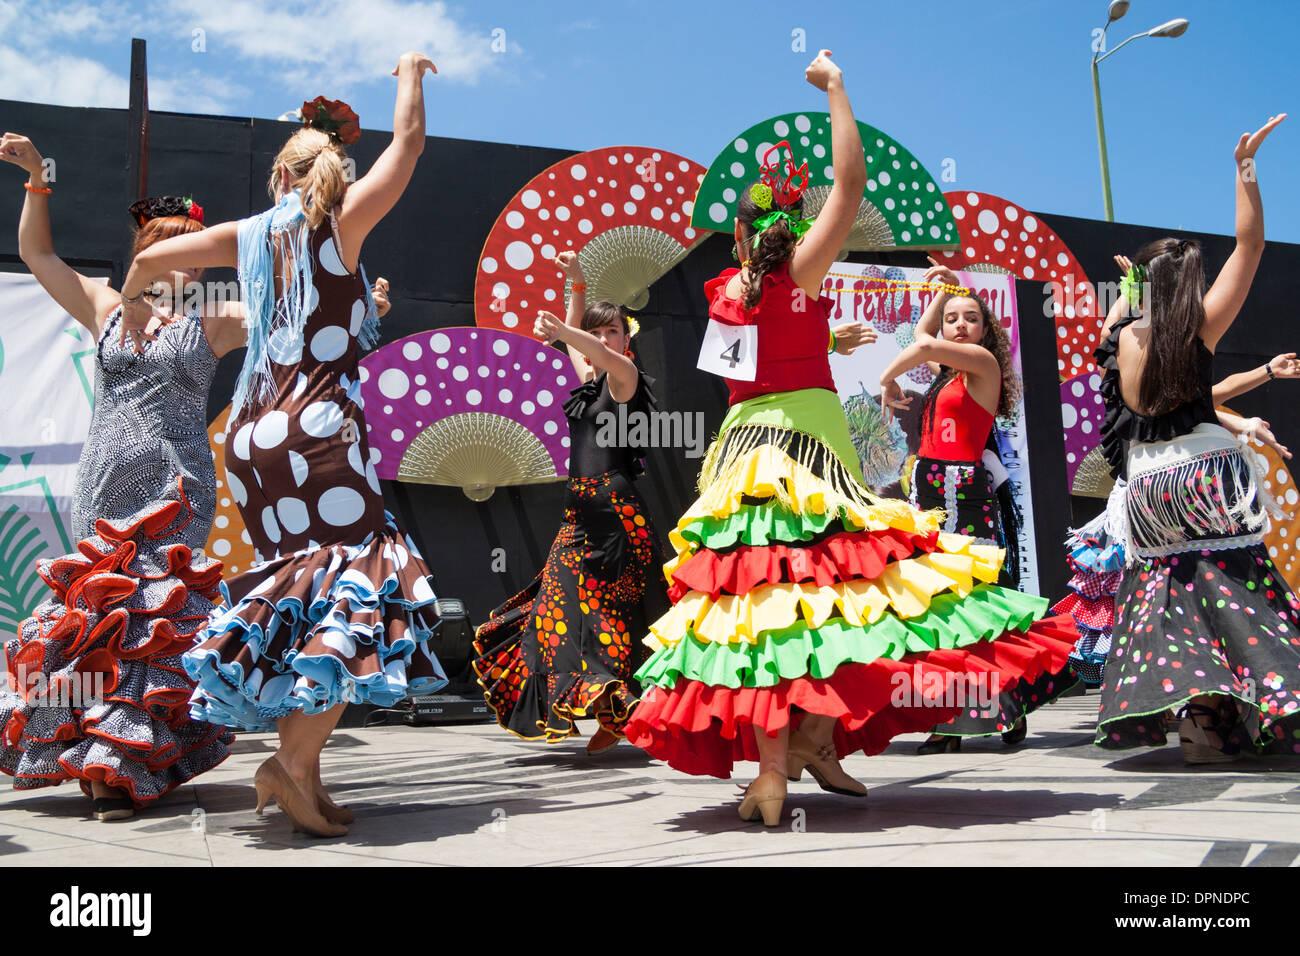 Flamenco-Tänzer bei Feria de Abril Flamenco Wochenende in Las Palmas, Gran Canaria, Kanarische Inseln, Spanien Stockfoto